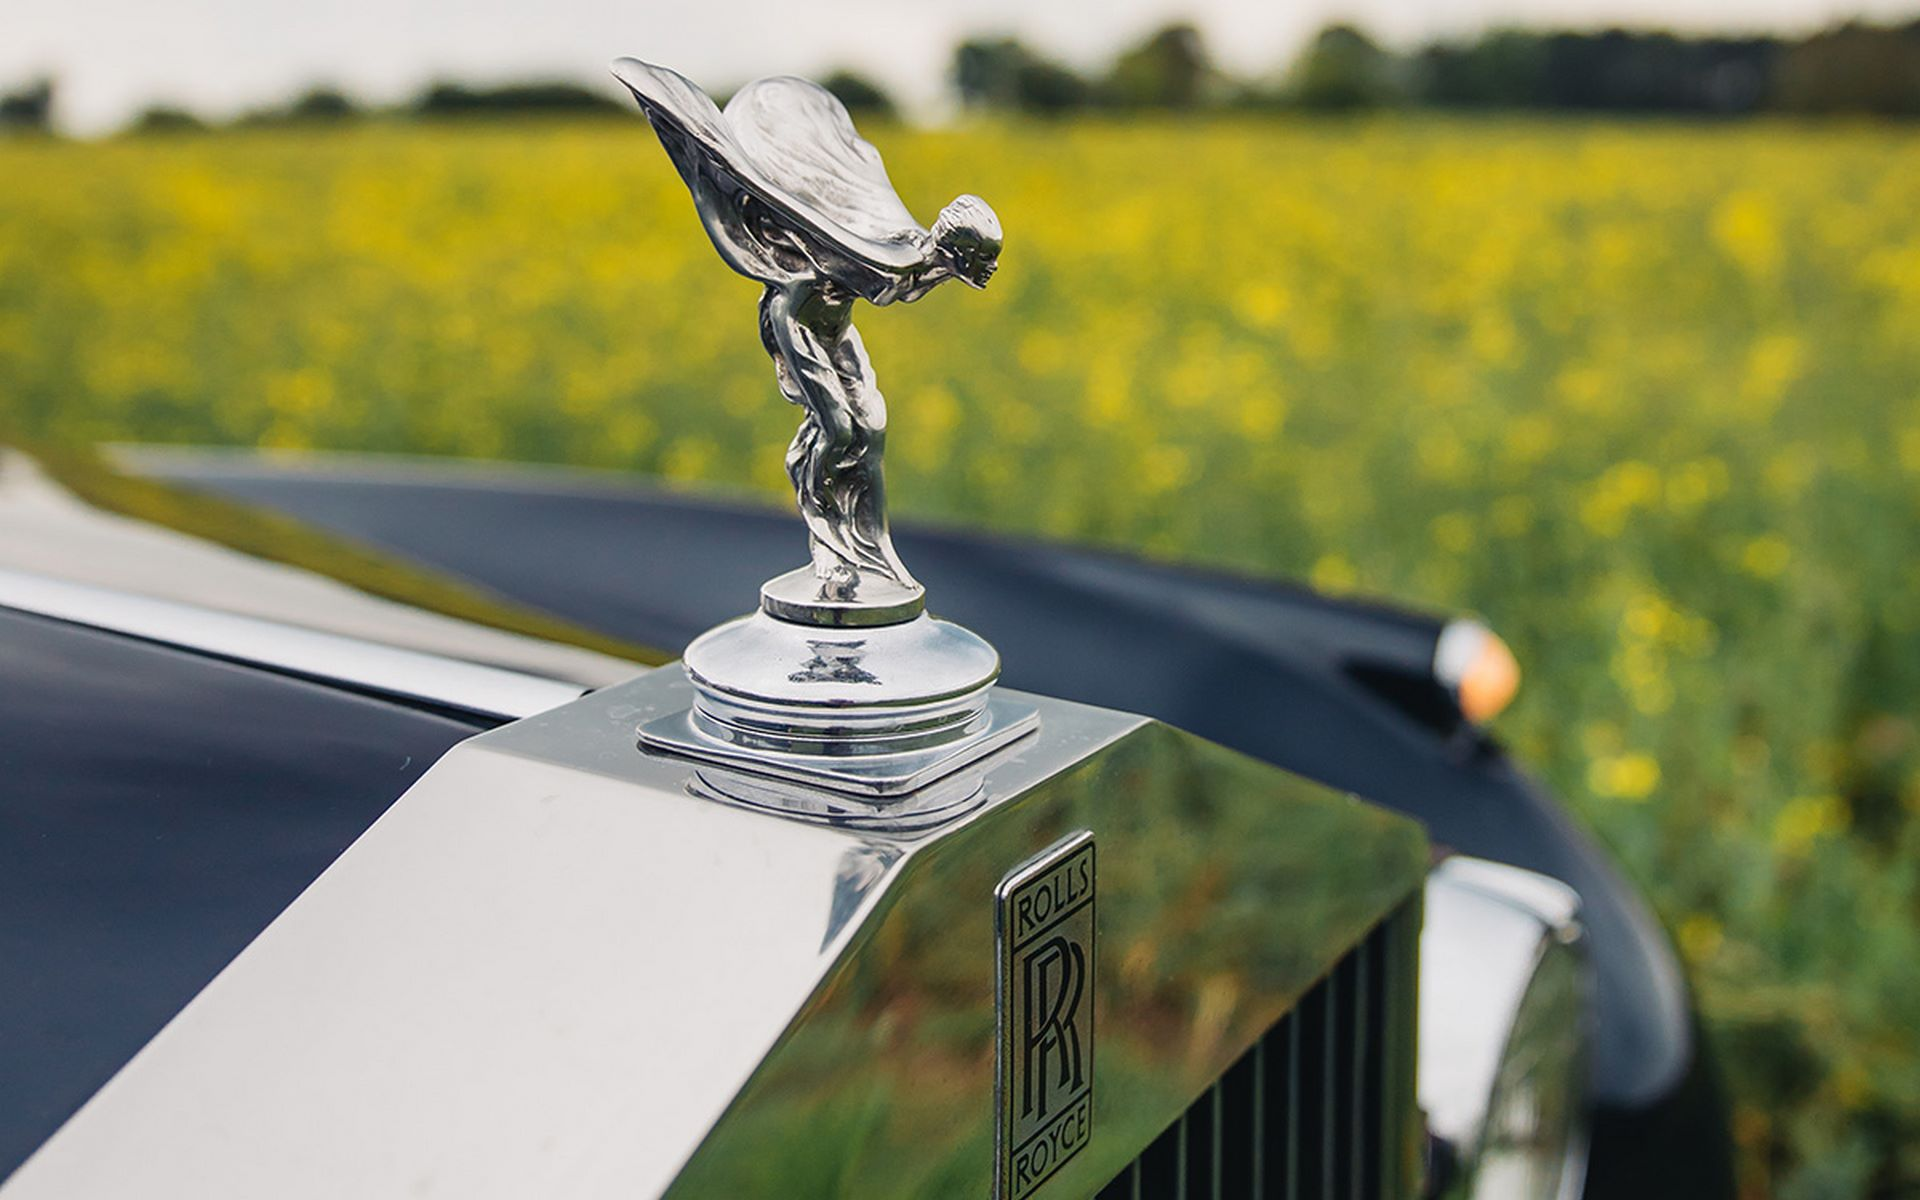 Electris-Rolls-Royce-Phantom-V-and-Silver-Cloud-by-Lunaz-13